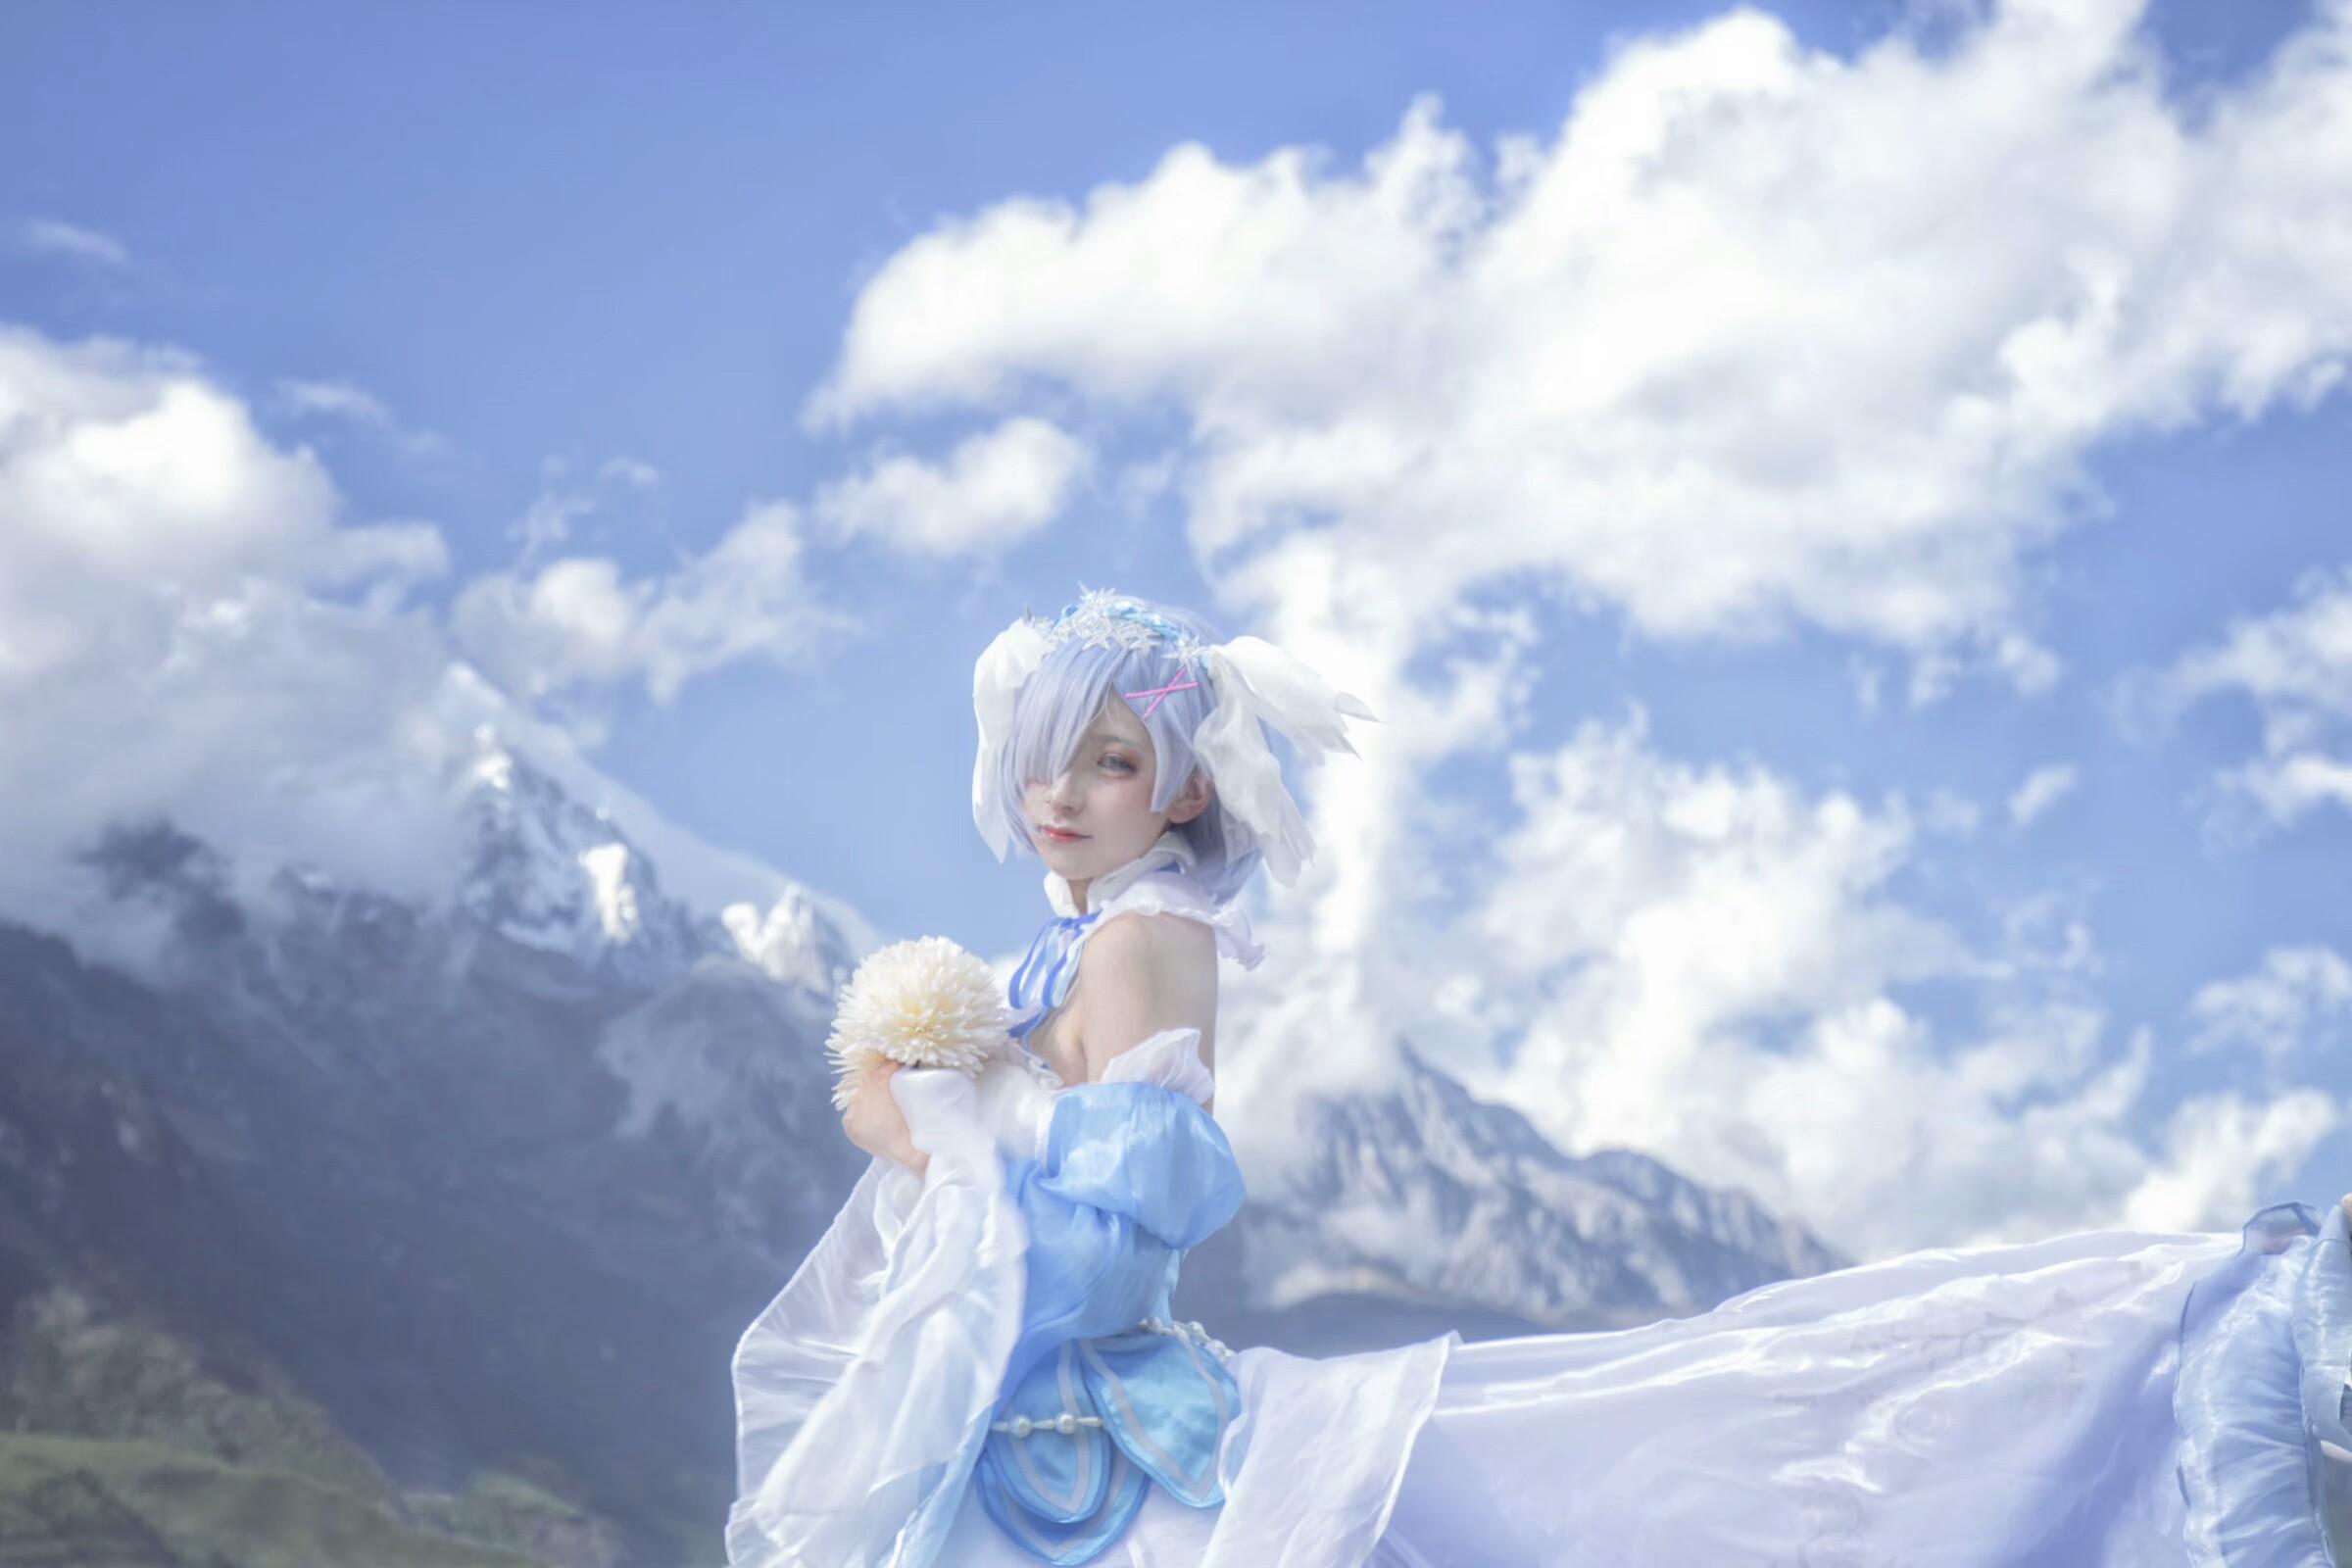 《RE:从零开始的异世界生活》十一cosplay【CN:咸鱼爱扯淡】-第7张